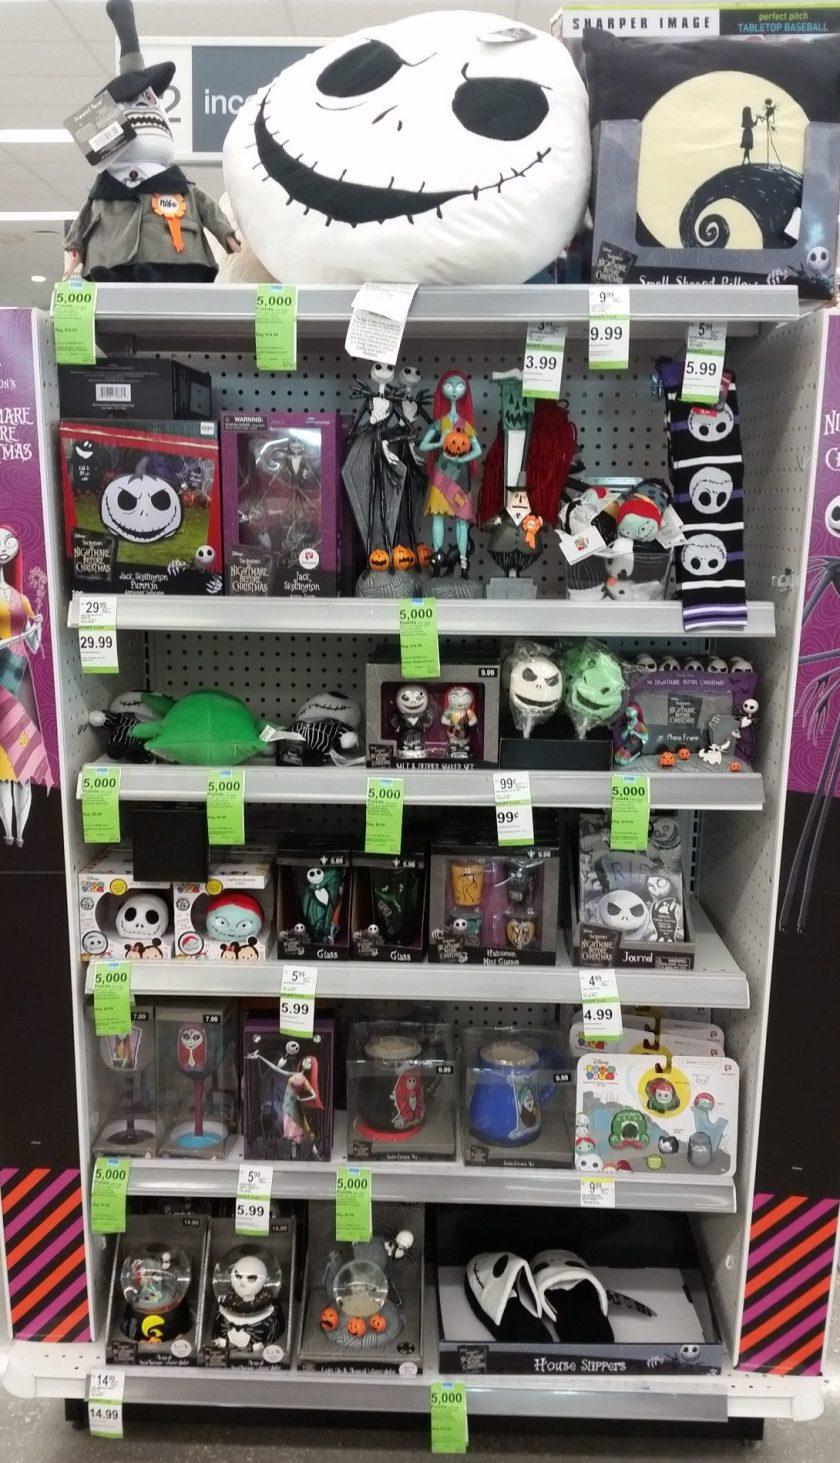 Walgreens 2020 Halloween Halloween Deals at Walgreens = 5000 Balance Rewards Points